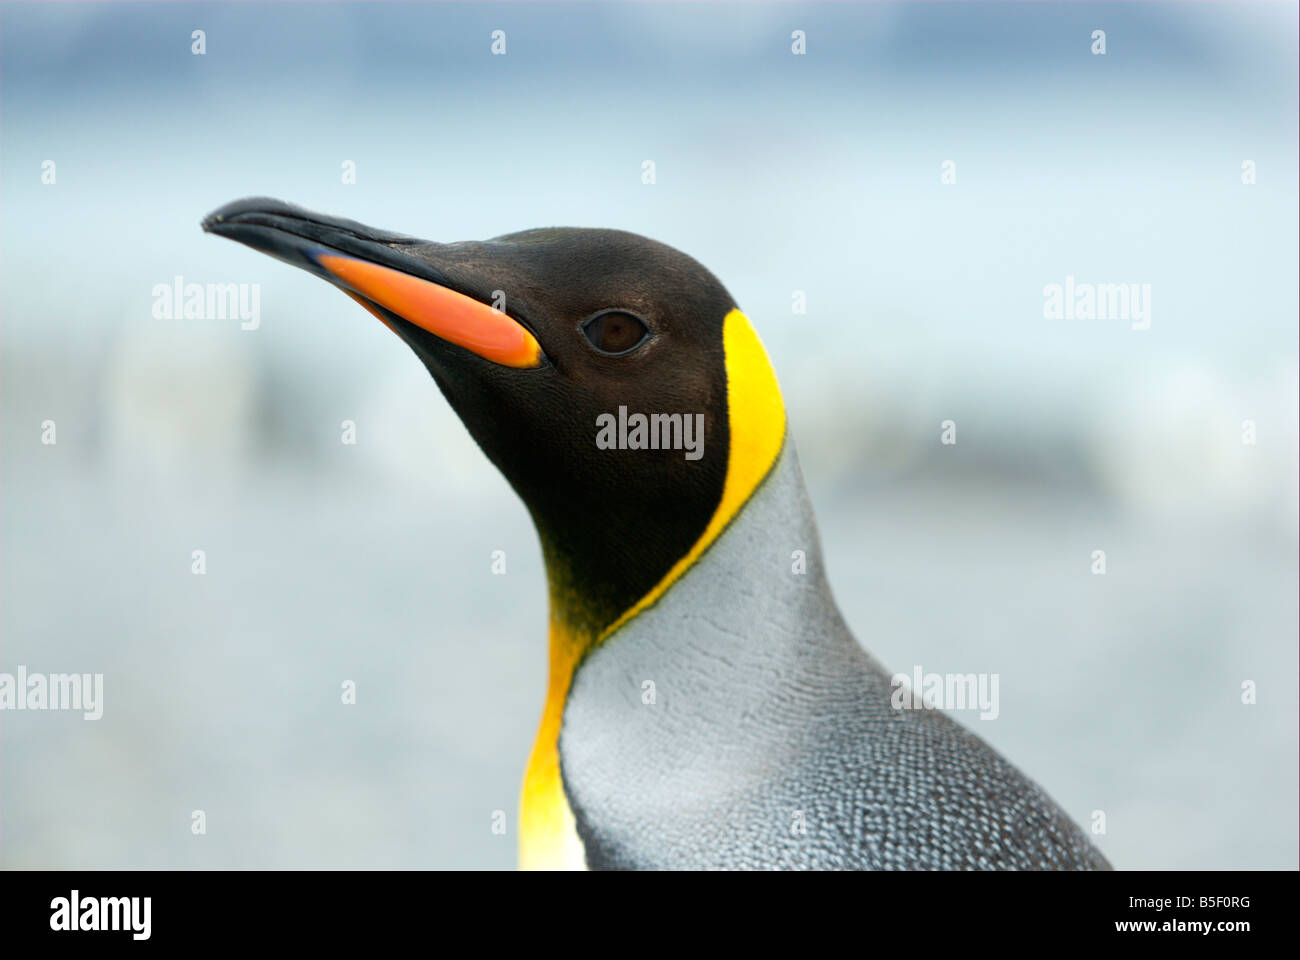 Perfil de un pingüino rey Imagen De Stock